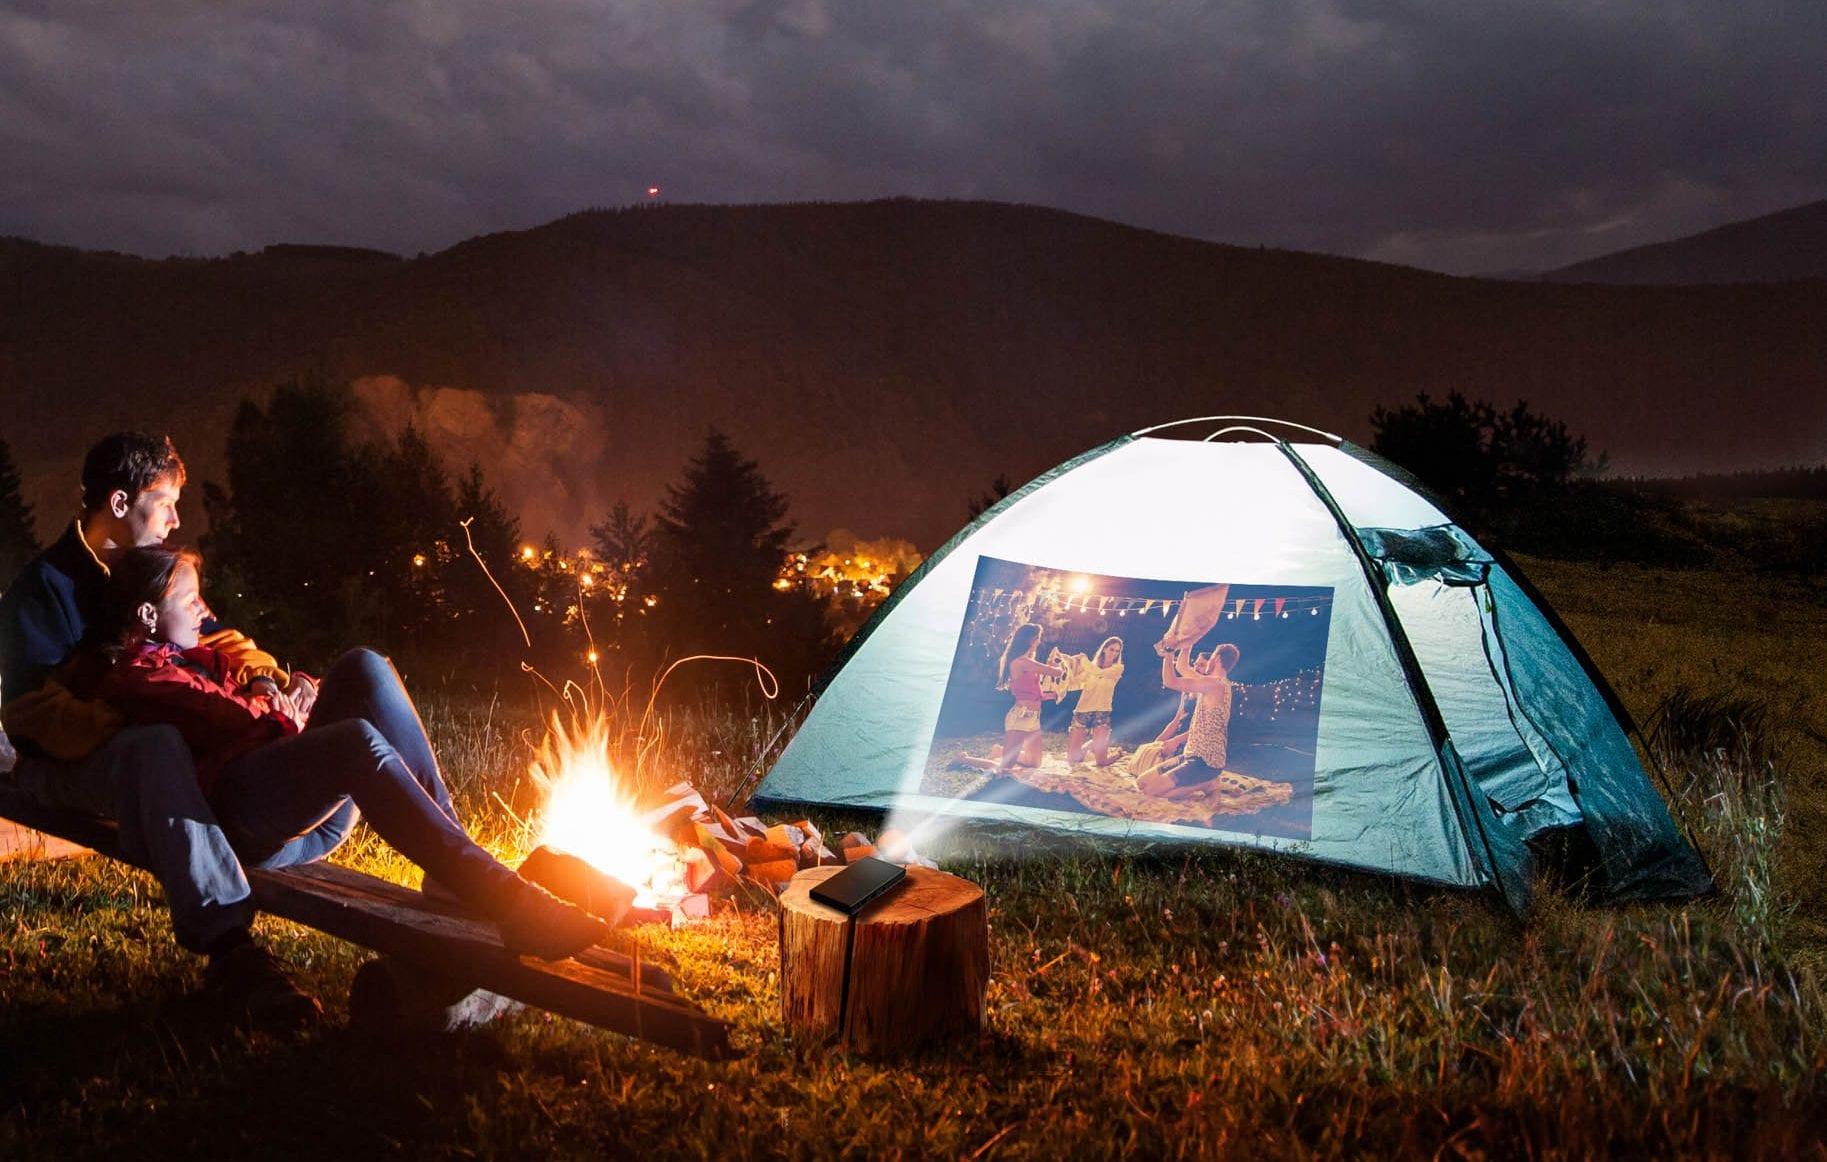 volledige aansluiting campings in Yellowstone Universiteit van Chicago aansluiting site